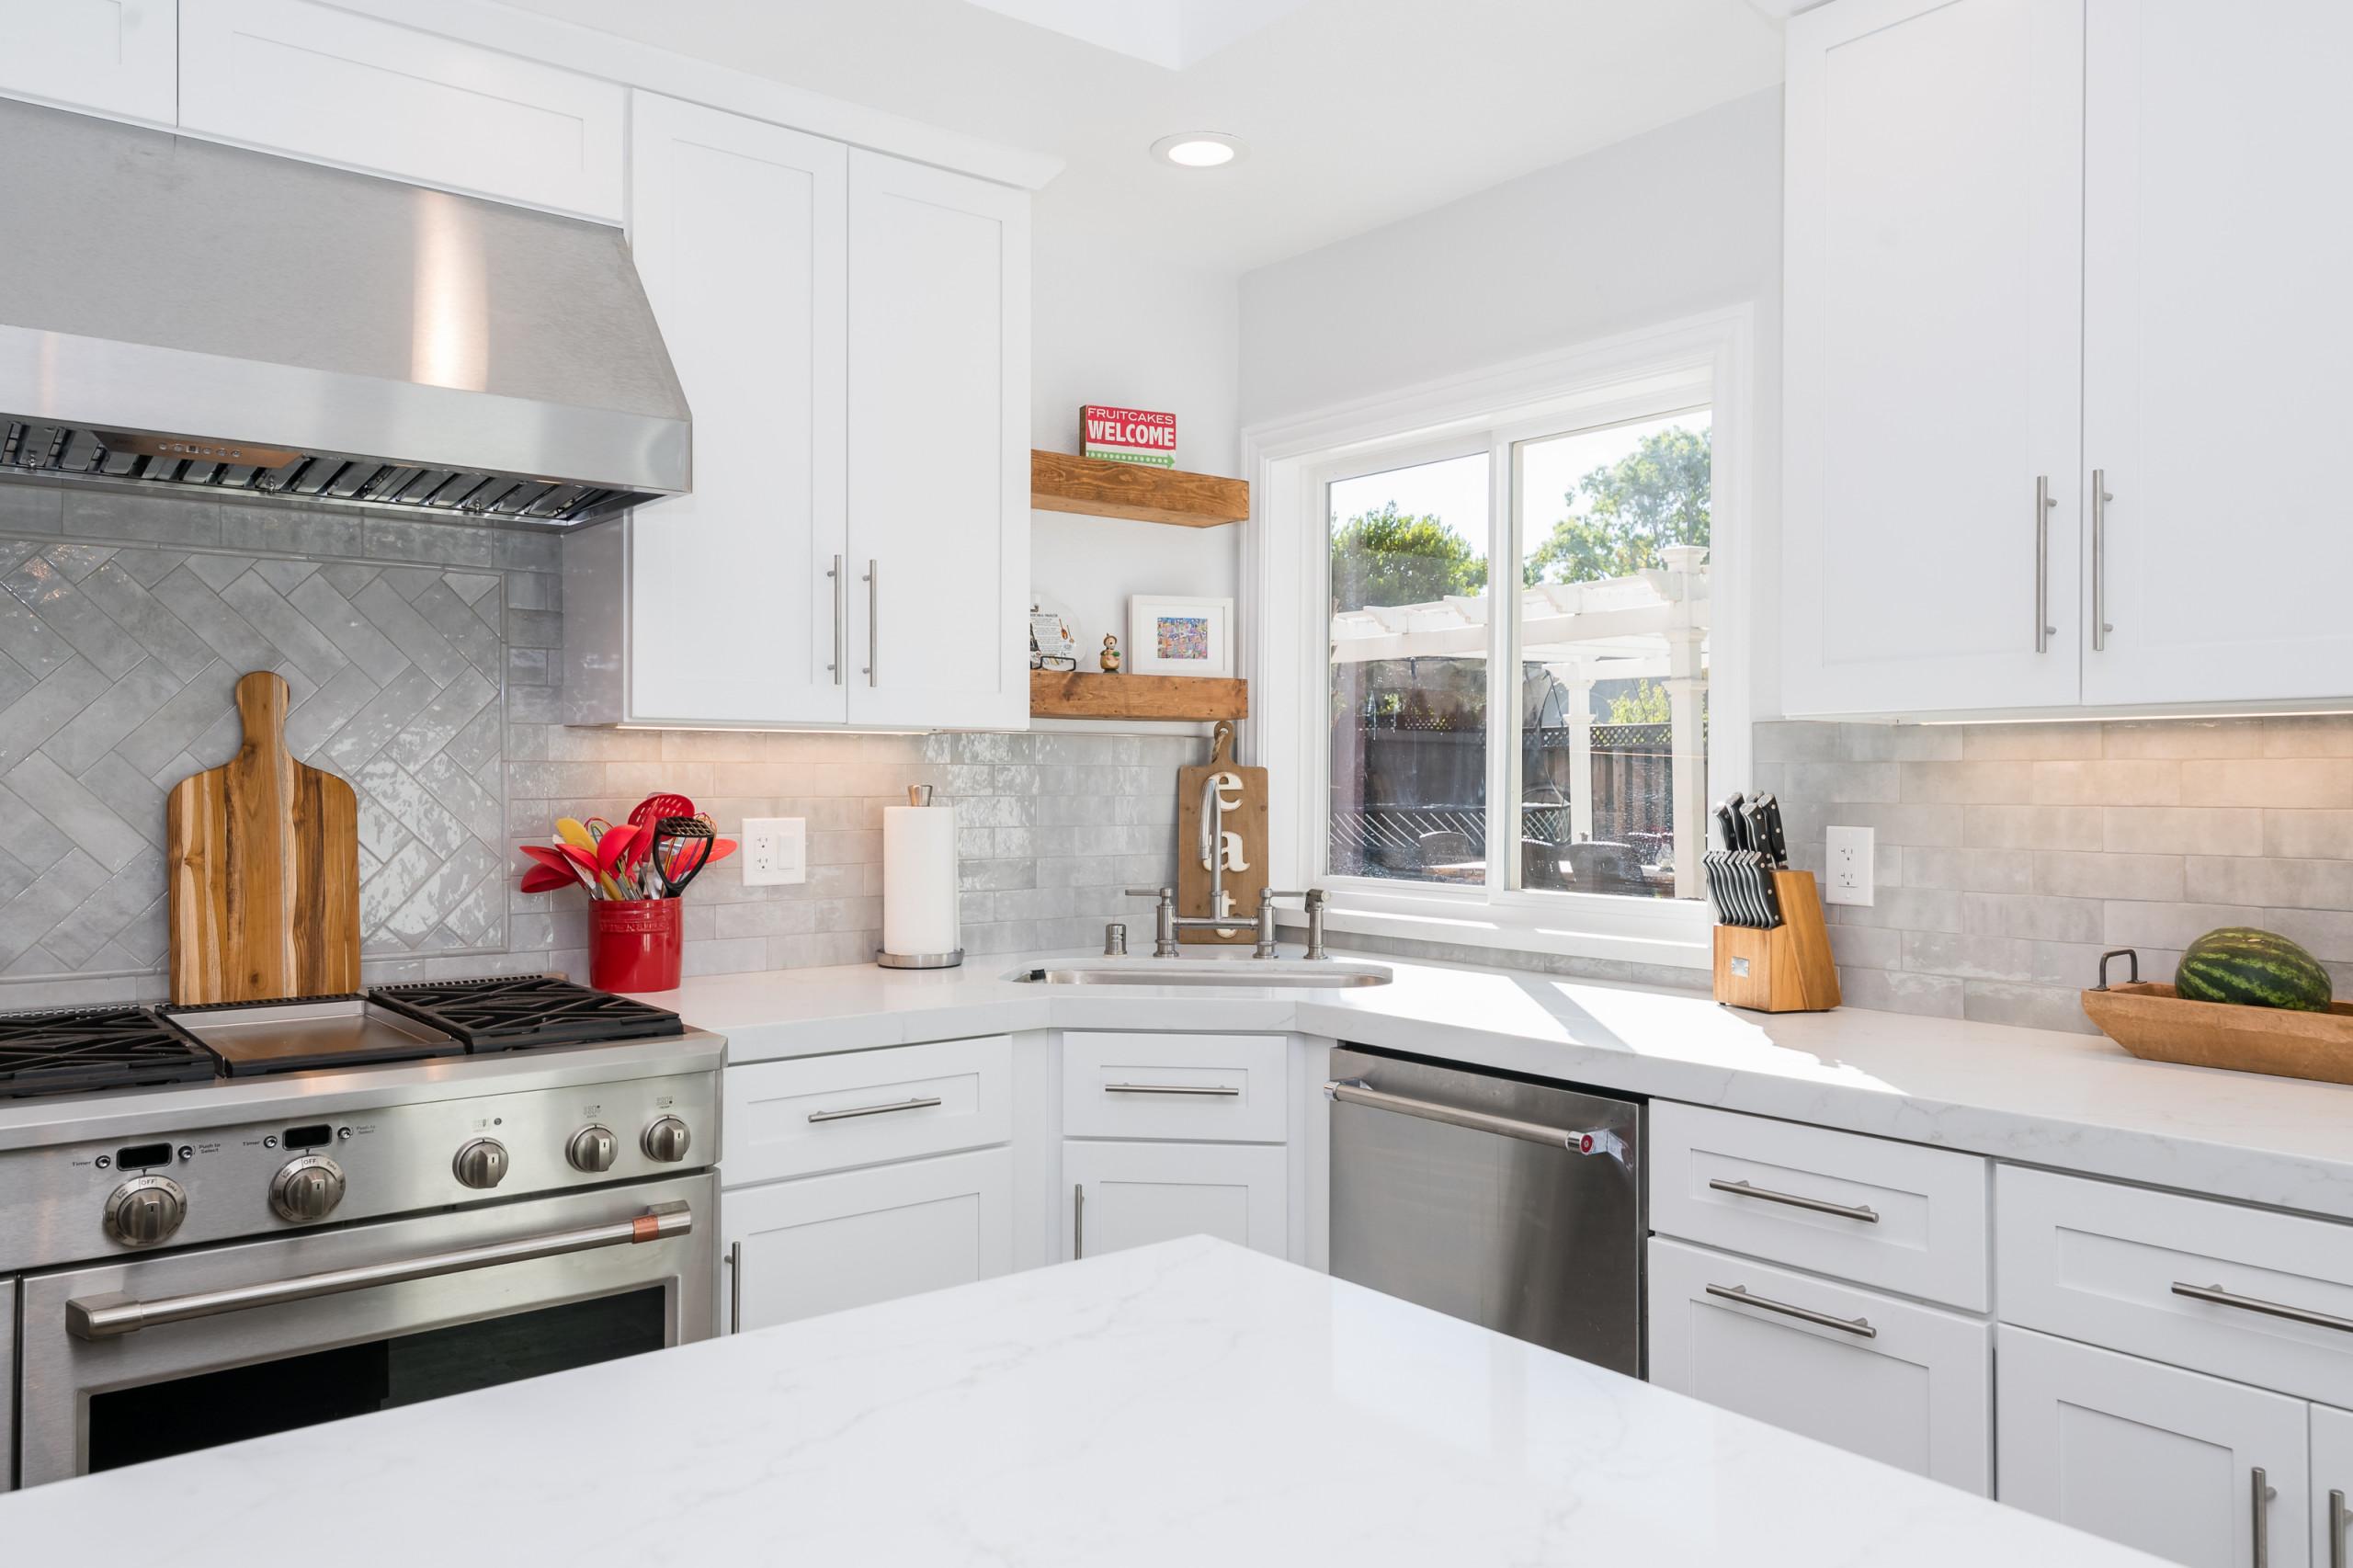 San Jose Kitchen remodel